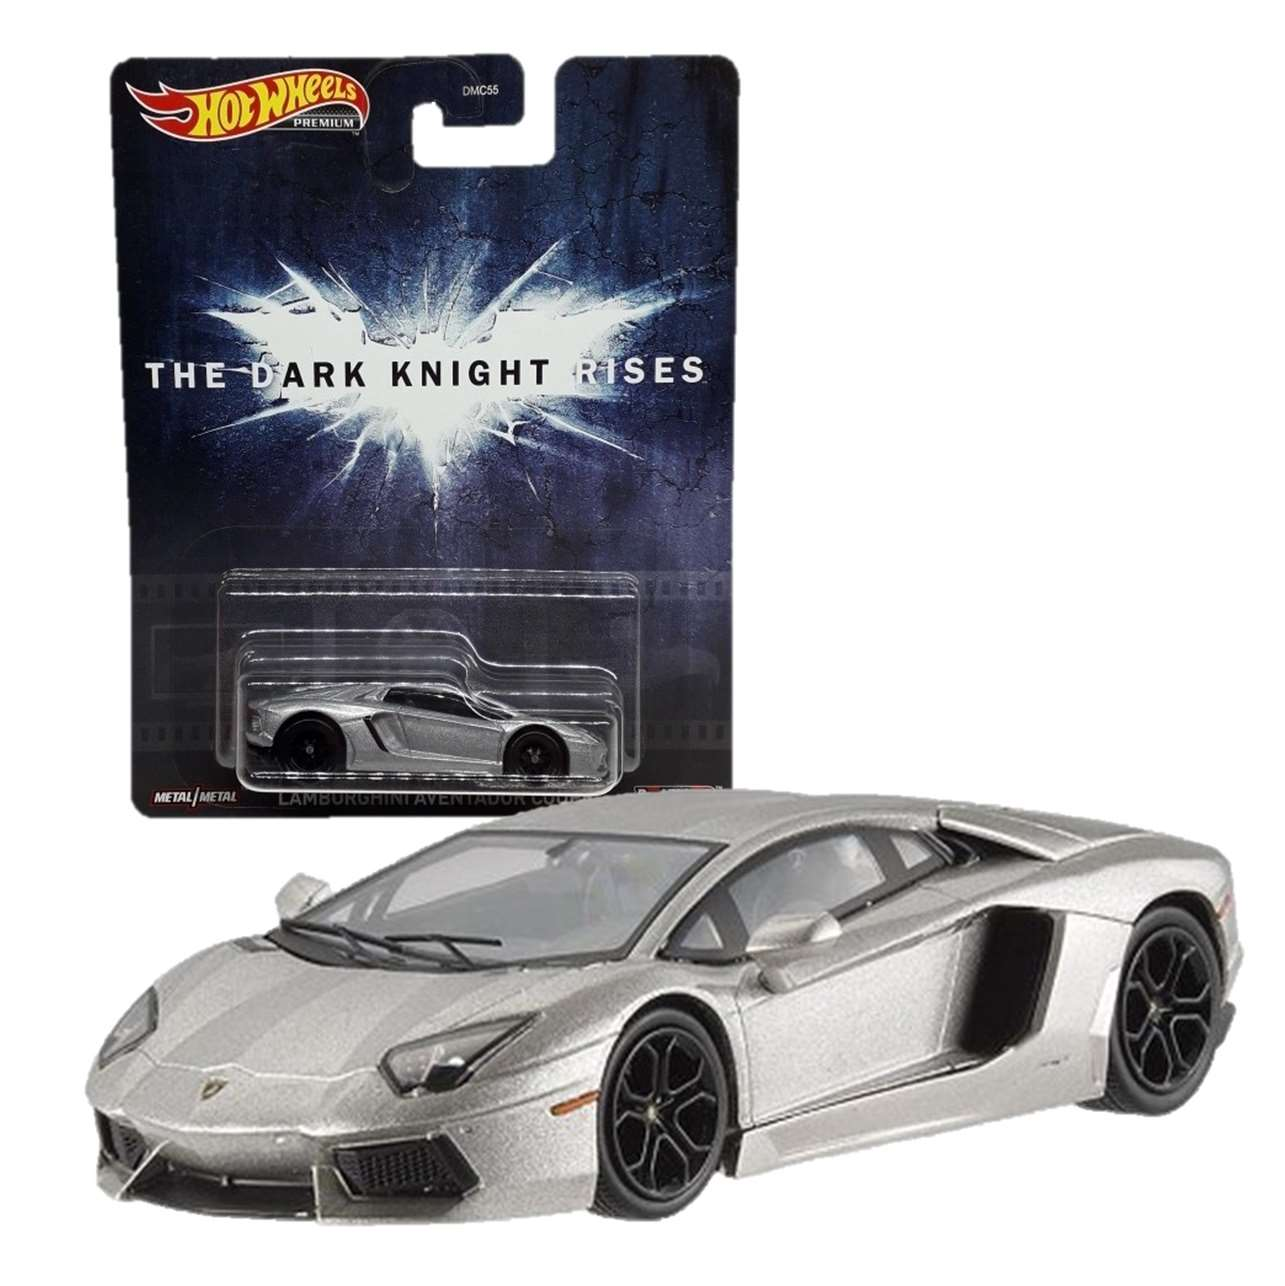 Lamborghini Aventador Coupé The Dark Knight Rises Hot Wheels